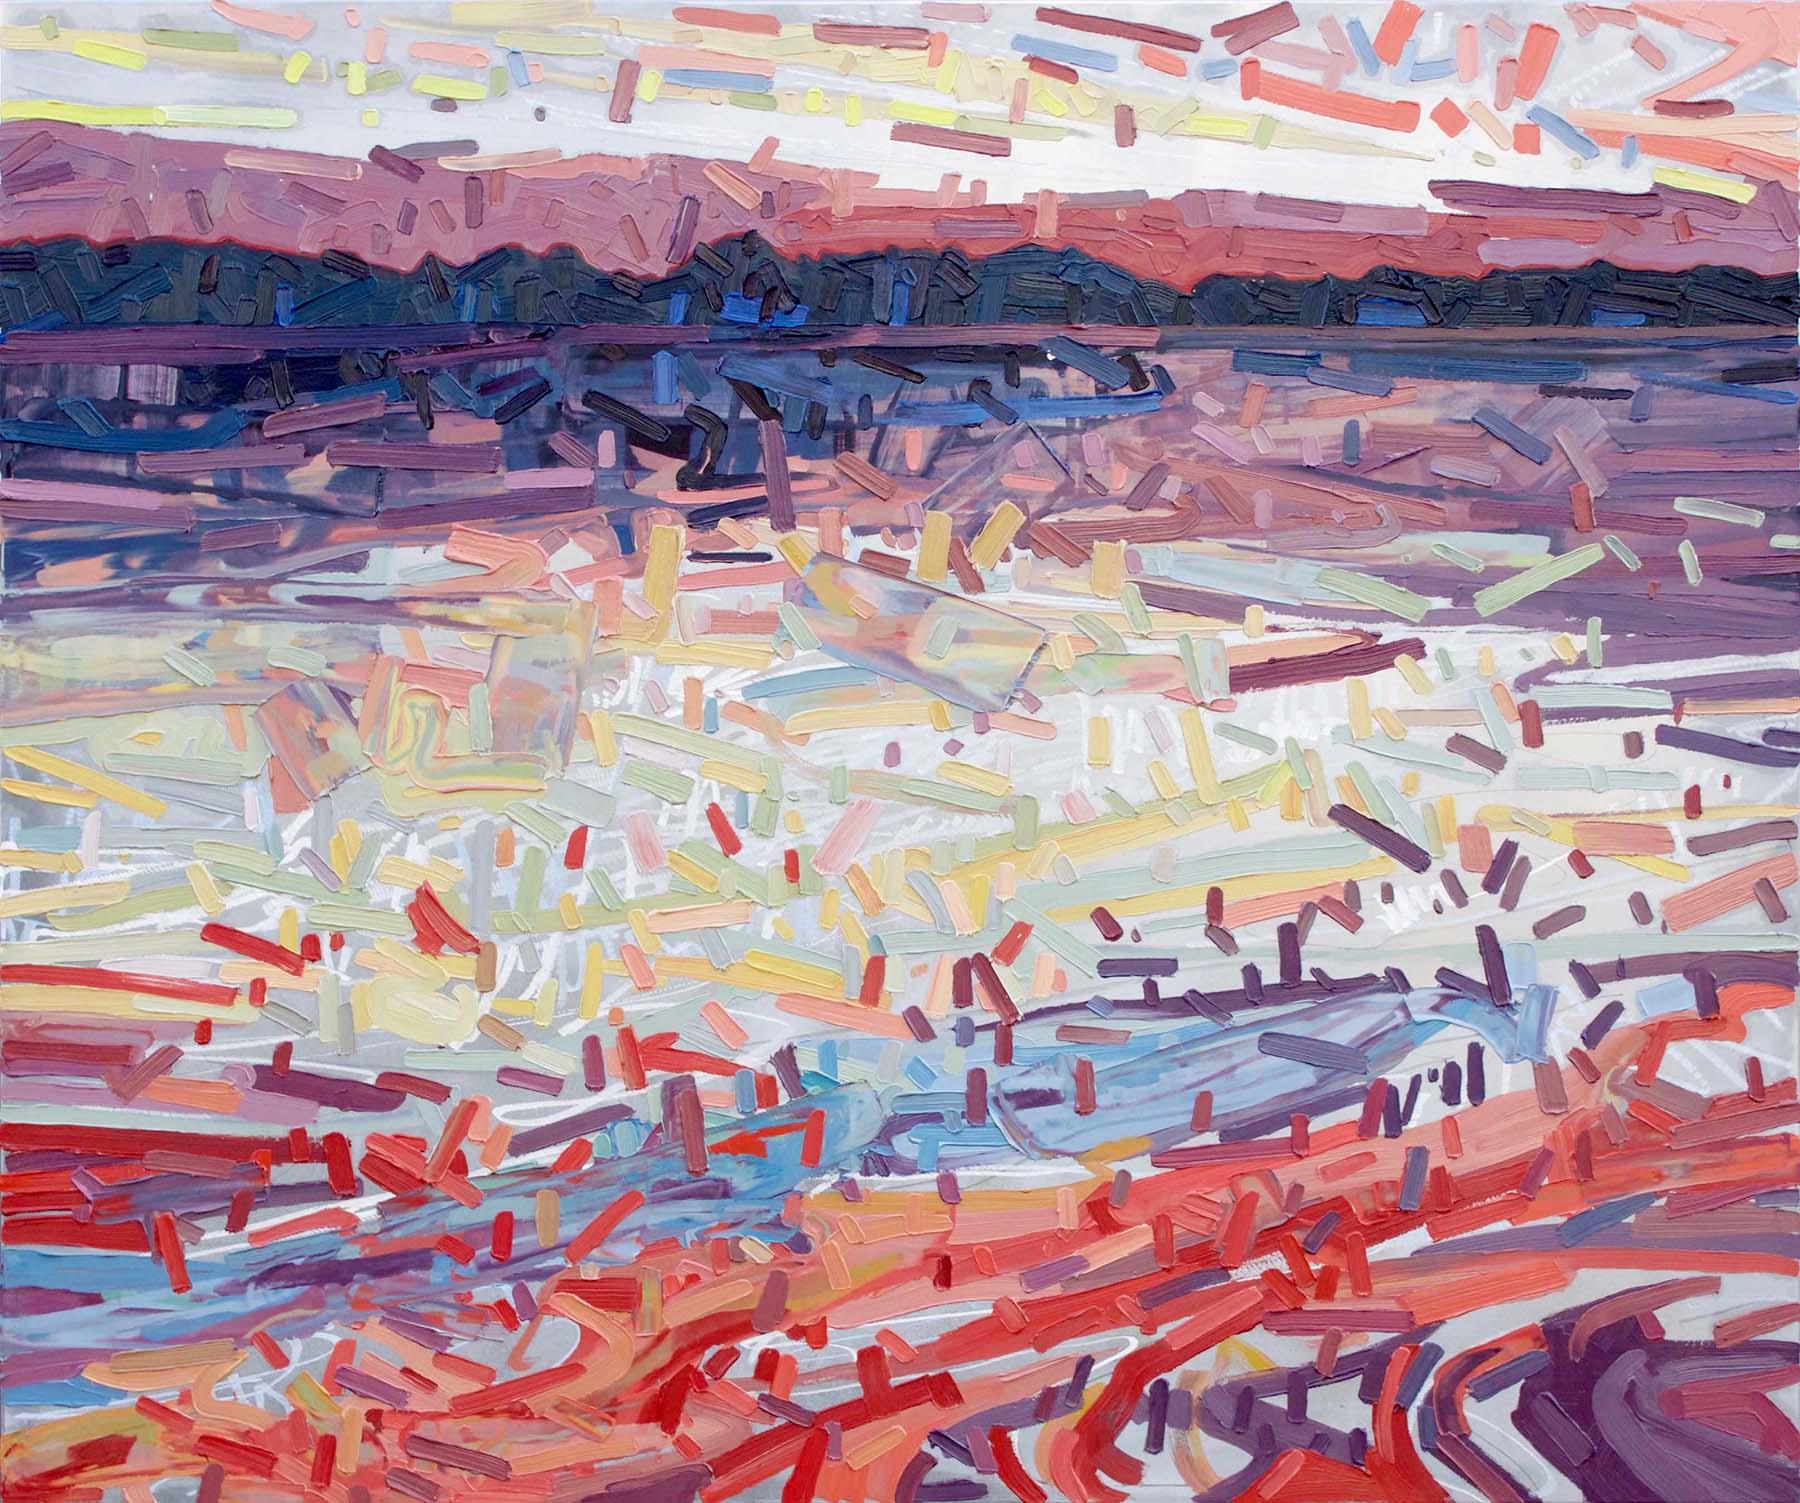 Reflecting on Tom - David Grieve